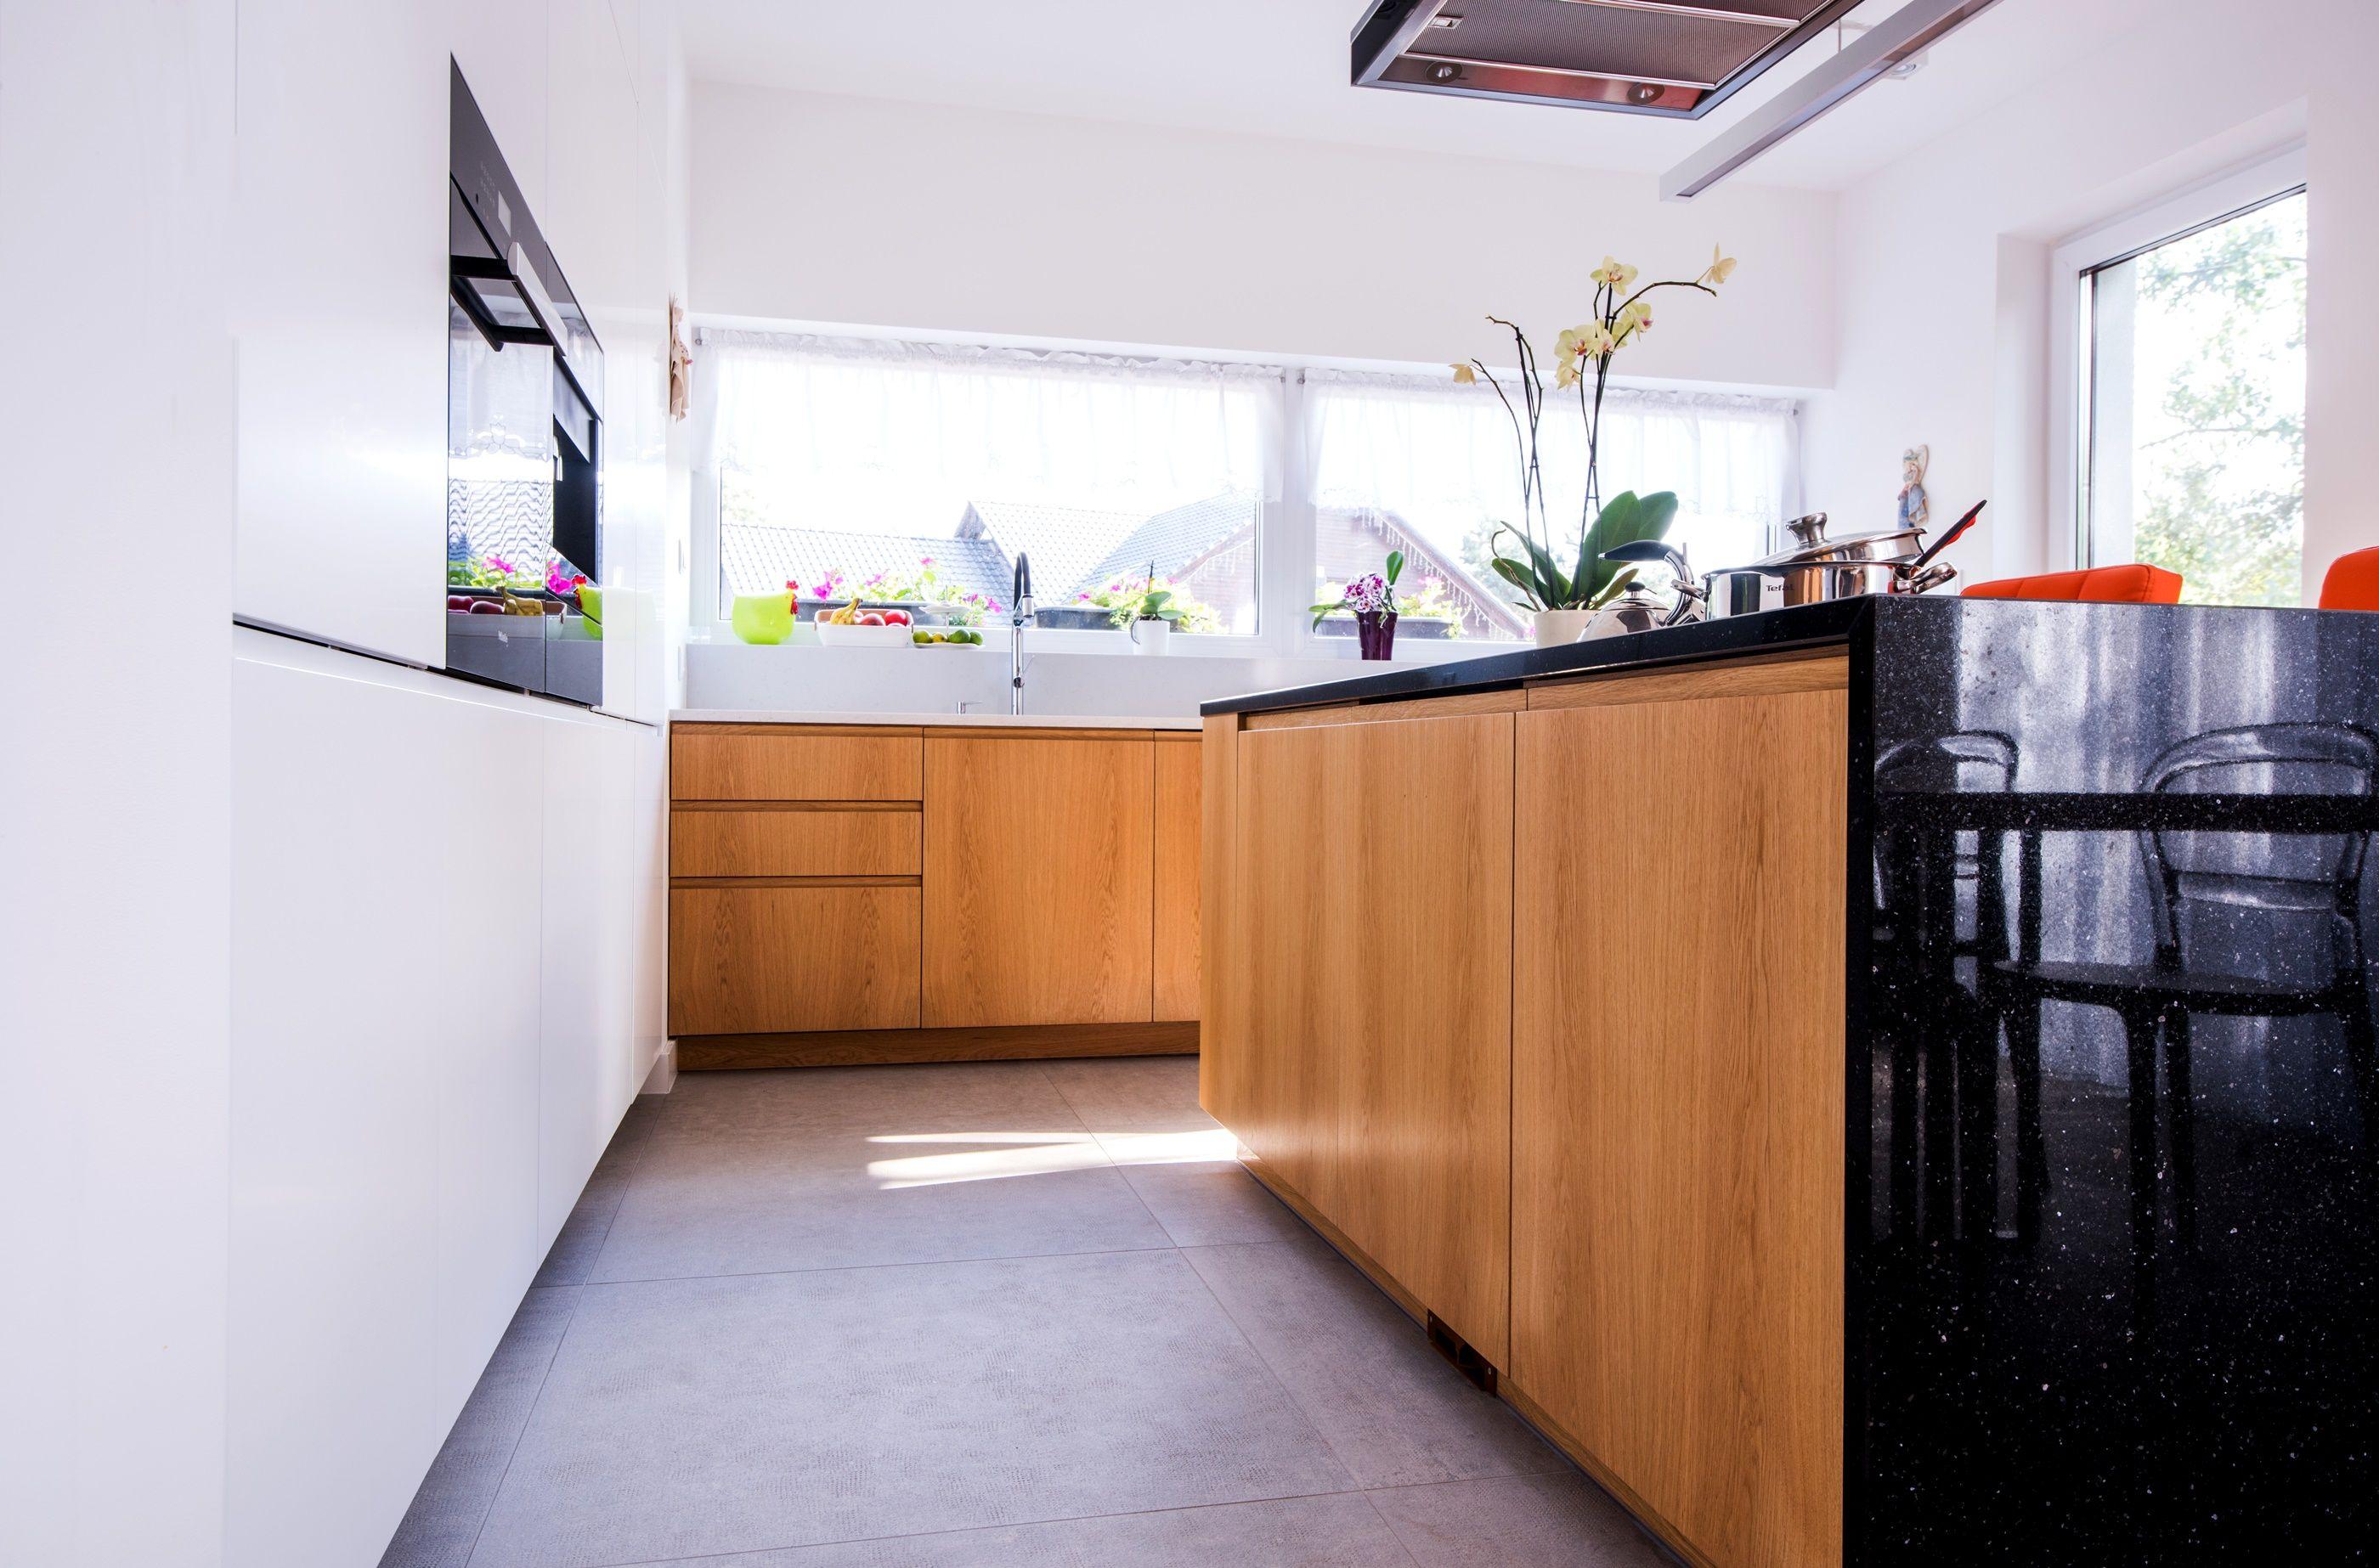 Kuchnia Fronty Fornirowane Fronty Lakierowane Fornir Dab Naturalny Blat Granit Konglomerat Uchwyty Frezowane Home Home Decor Kitchen